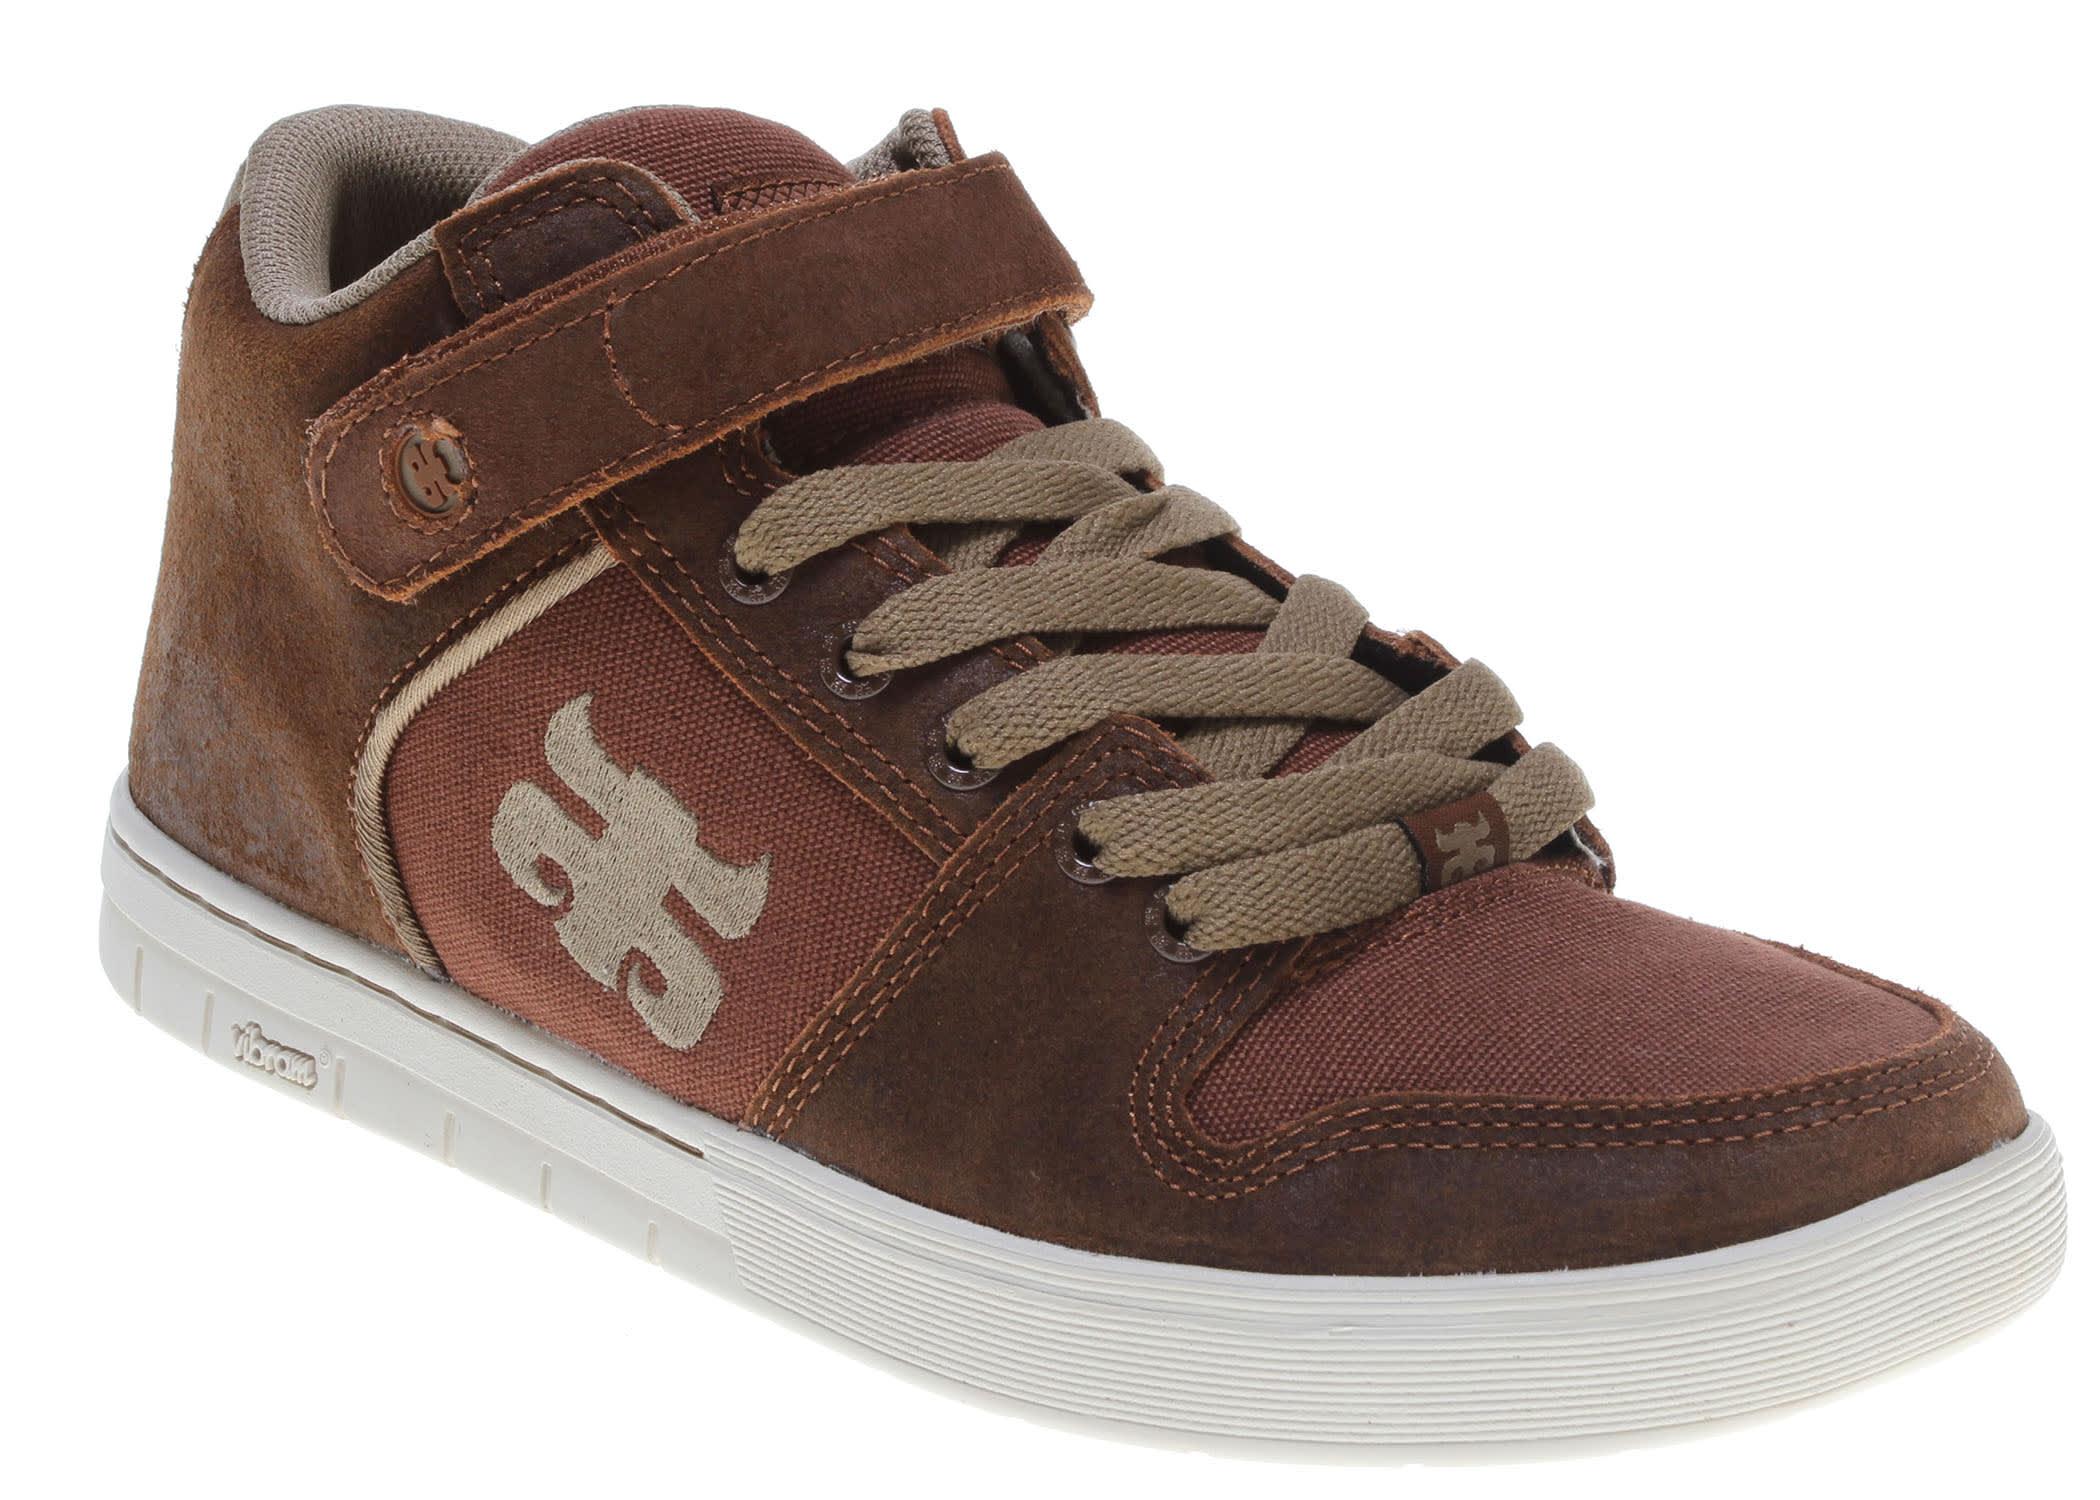 promo code 9063e 145ae ... Ipath Grasshopper SN Skate Shoes - thumbnail 2 ...